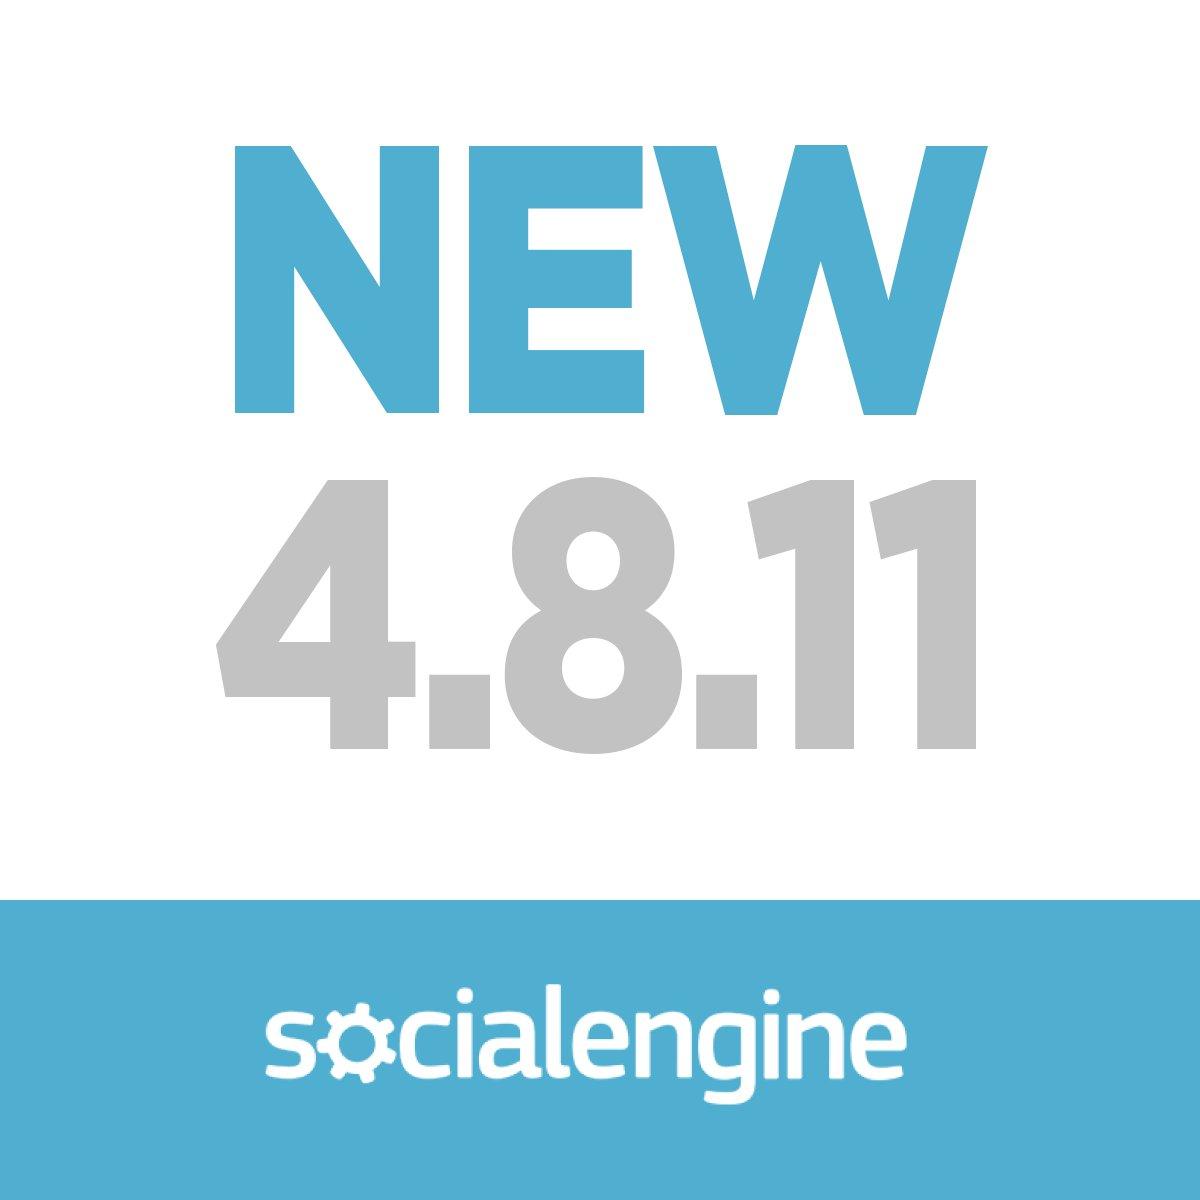 SocialEngine PHP 4.8.11 is here! Check it out: https://t.co/ZsDVJznI8m https://t.co/eGtQ4eMPzu